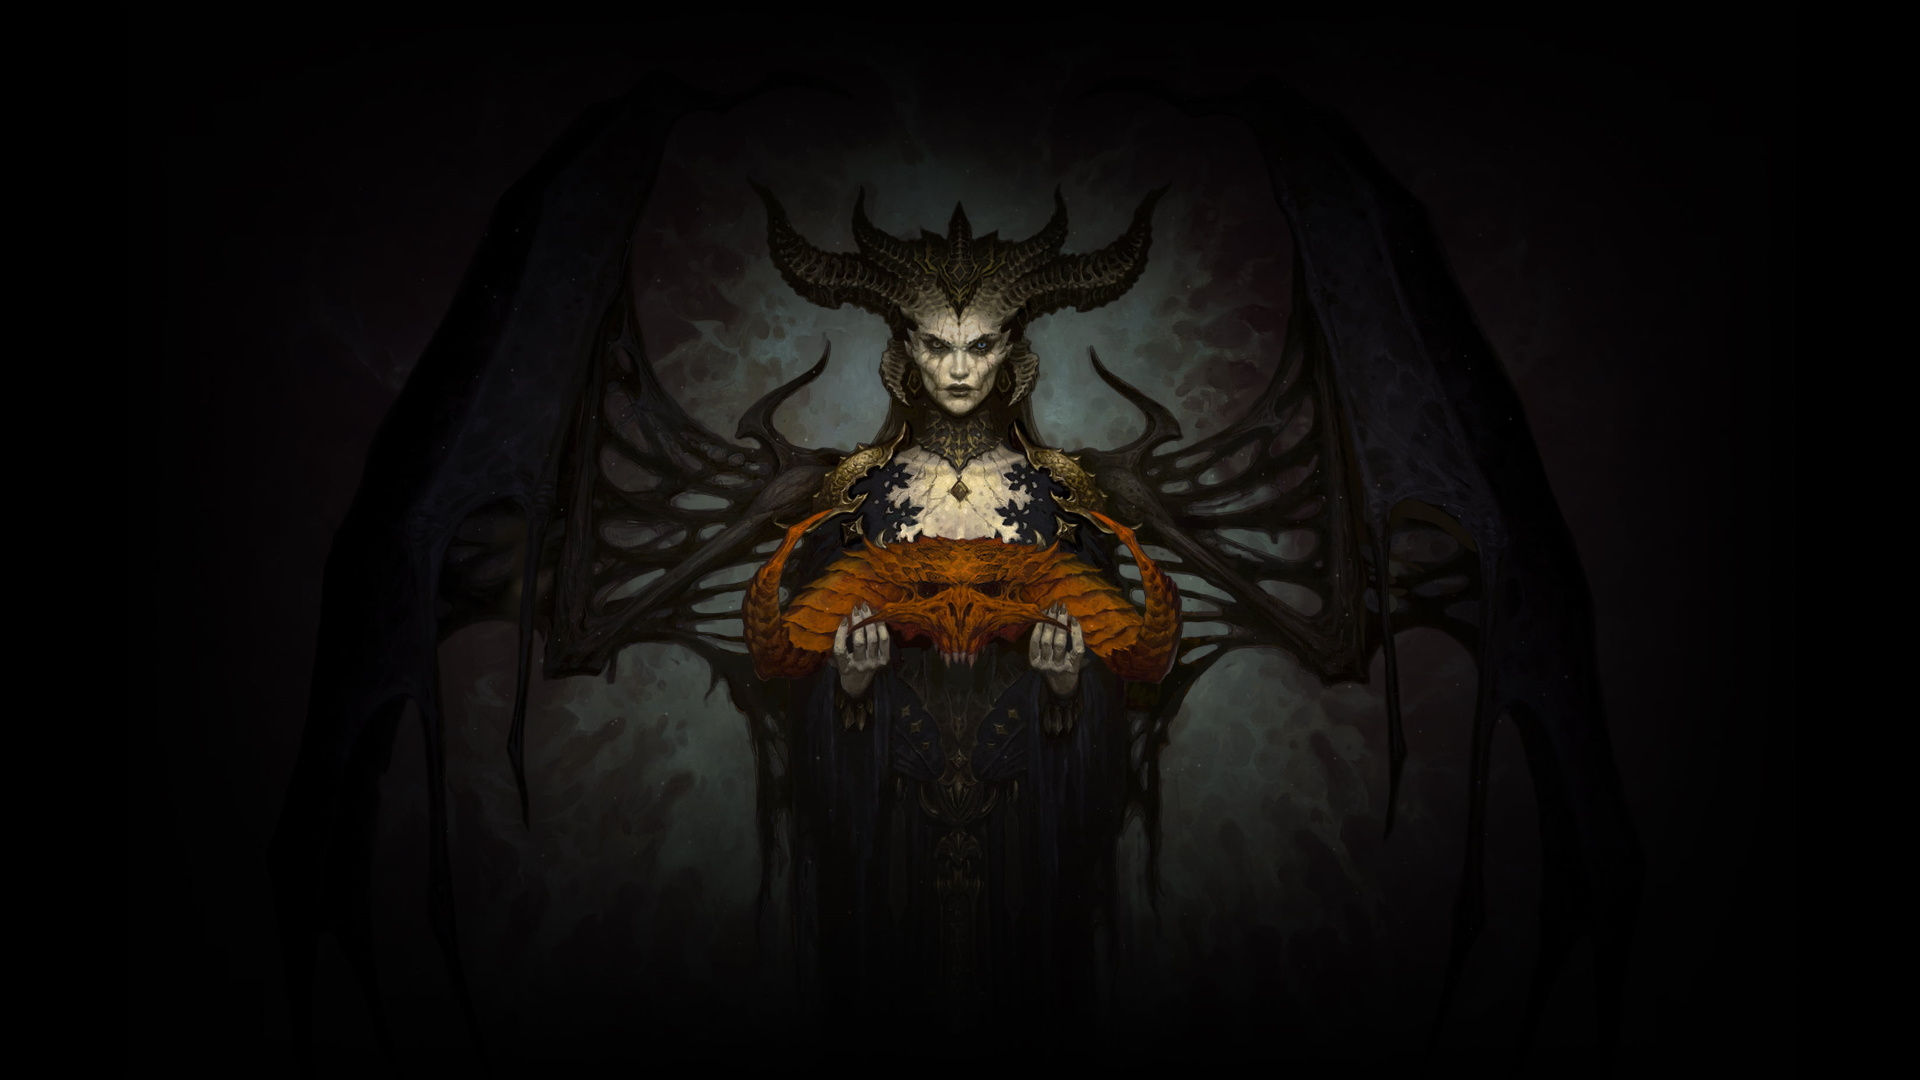 Blizzard мешает телеканалу Fox зарегистрировать торговую марку Diablo